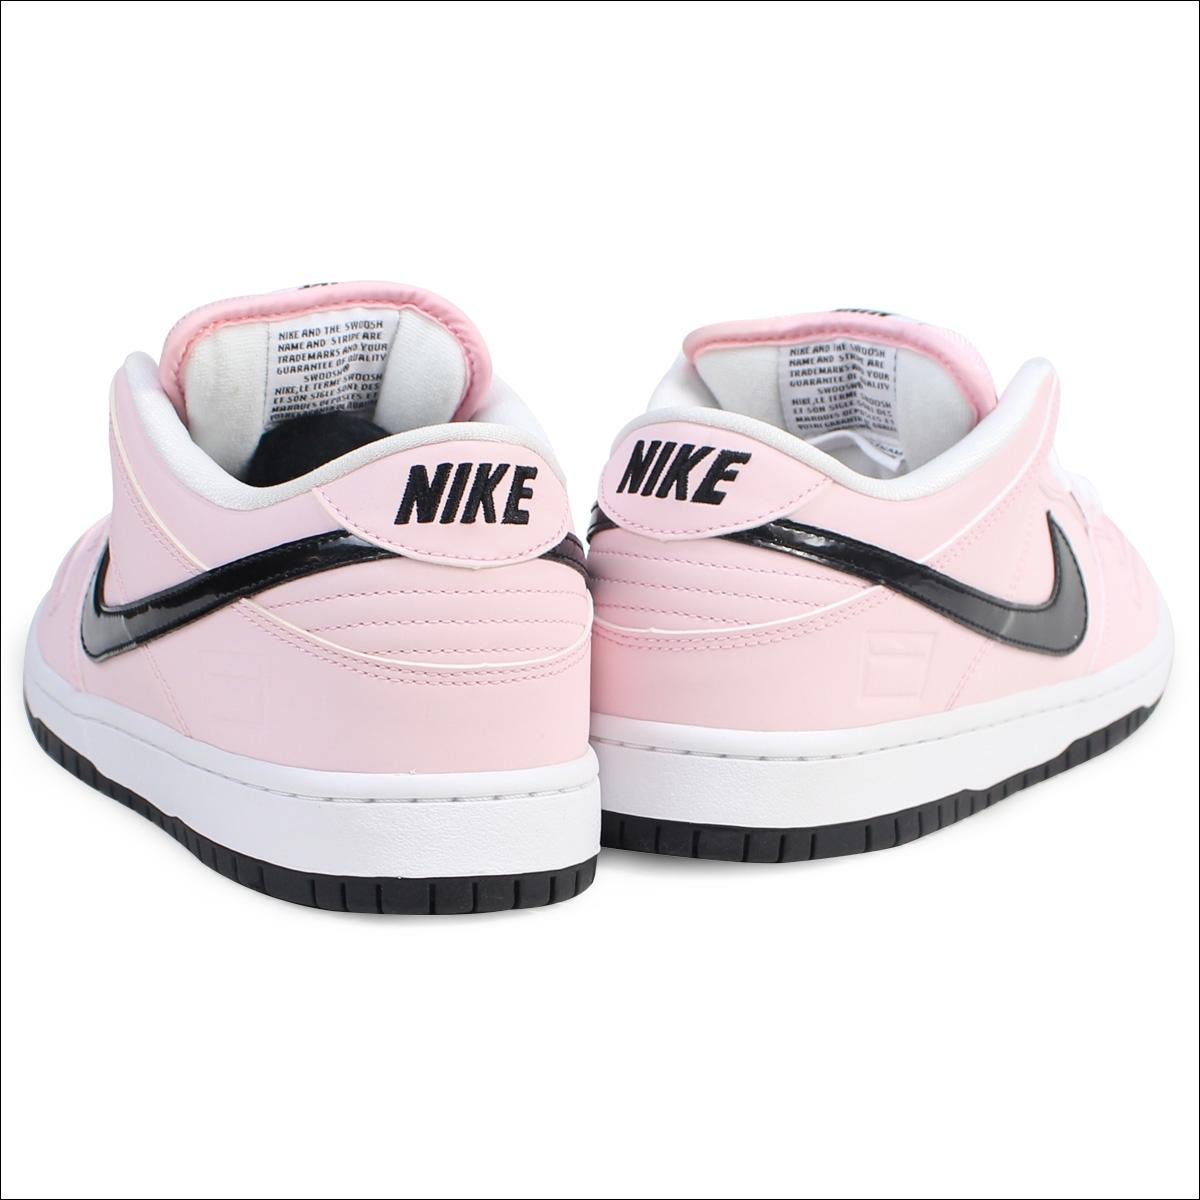 timeless design bd792 a0ddb Nike NIKE SB dunk low sneakers DUNK LOW ELITE PINK BOX 833,474-601 men s  pink